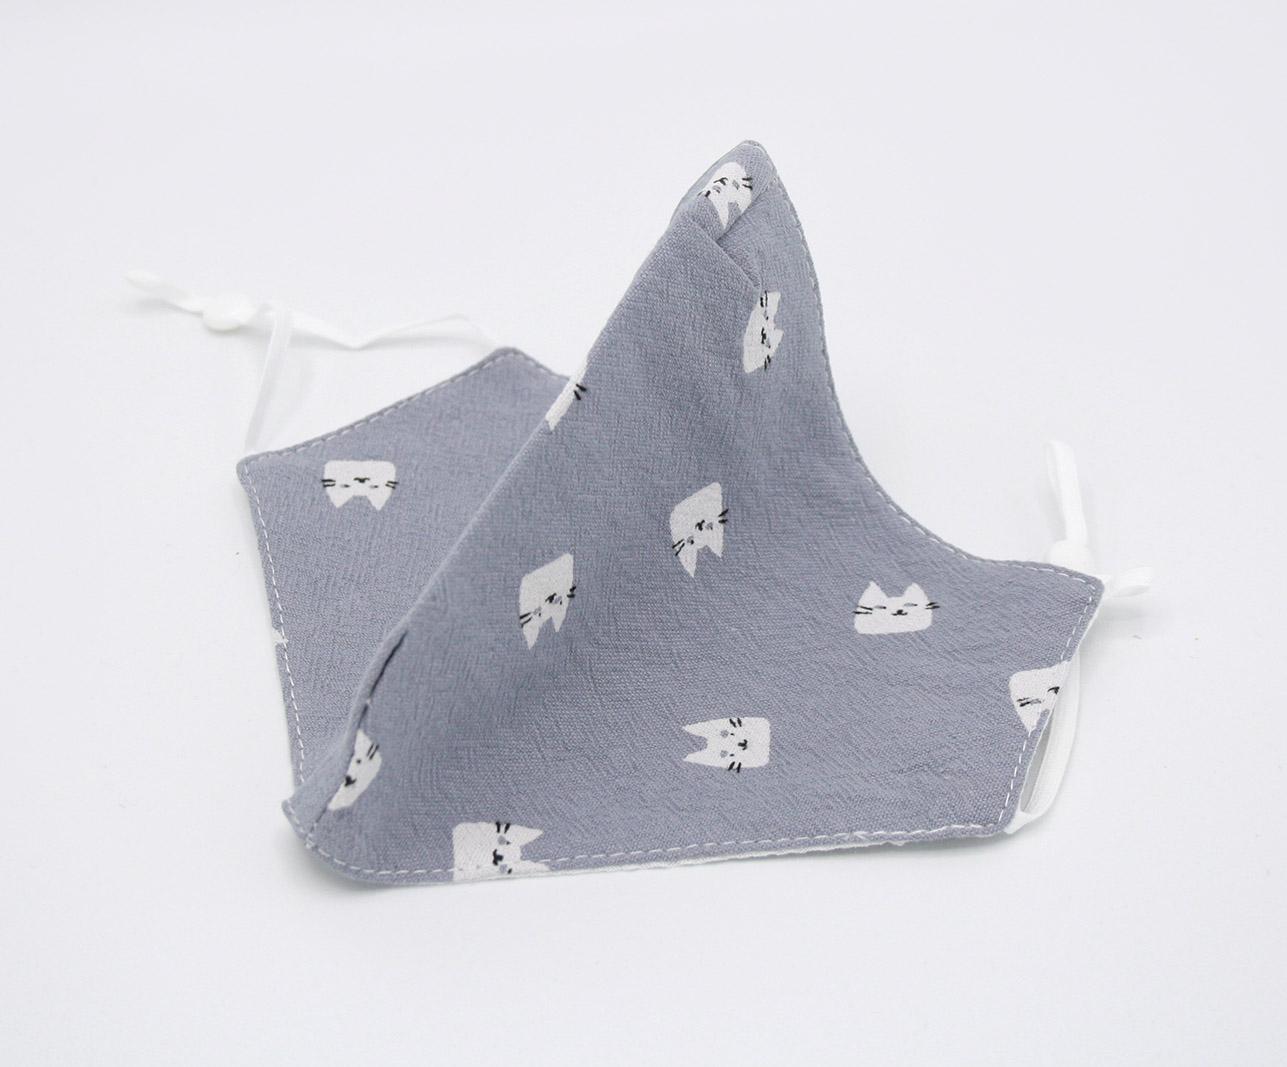 SEPIO Mondmaskertje mondkapje met opdruk poes katoen paars (6)